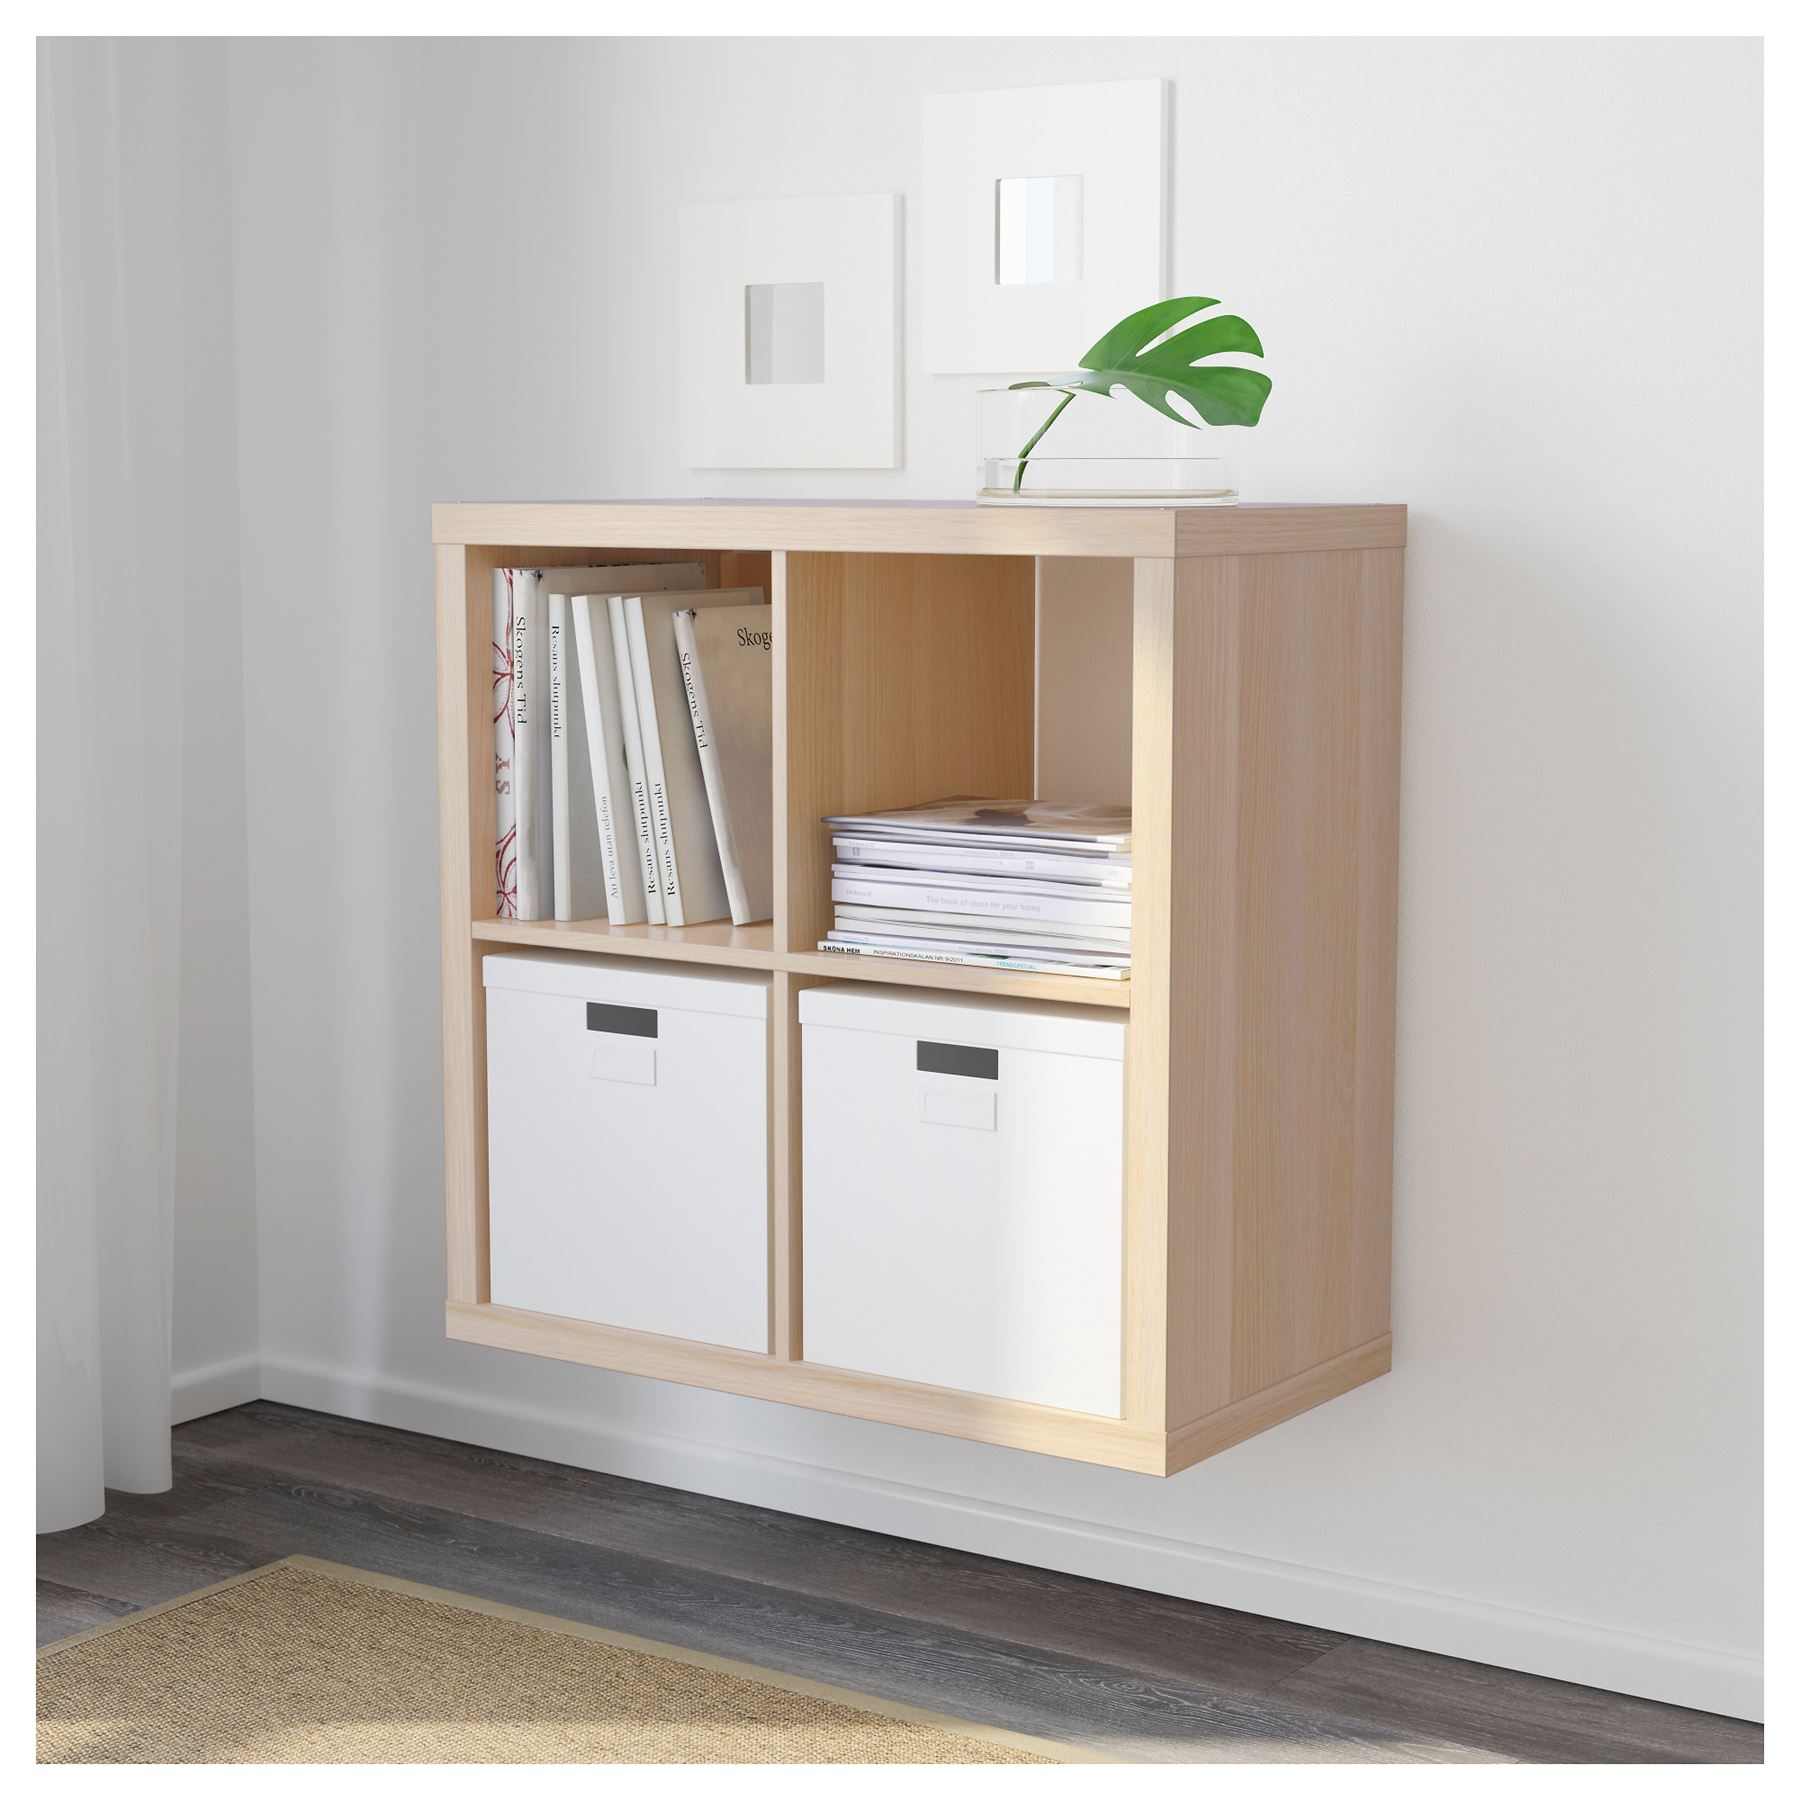 ikea kallax 4 cube storage bookcase square shelving unit various colours ebay